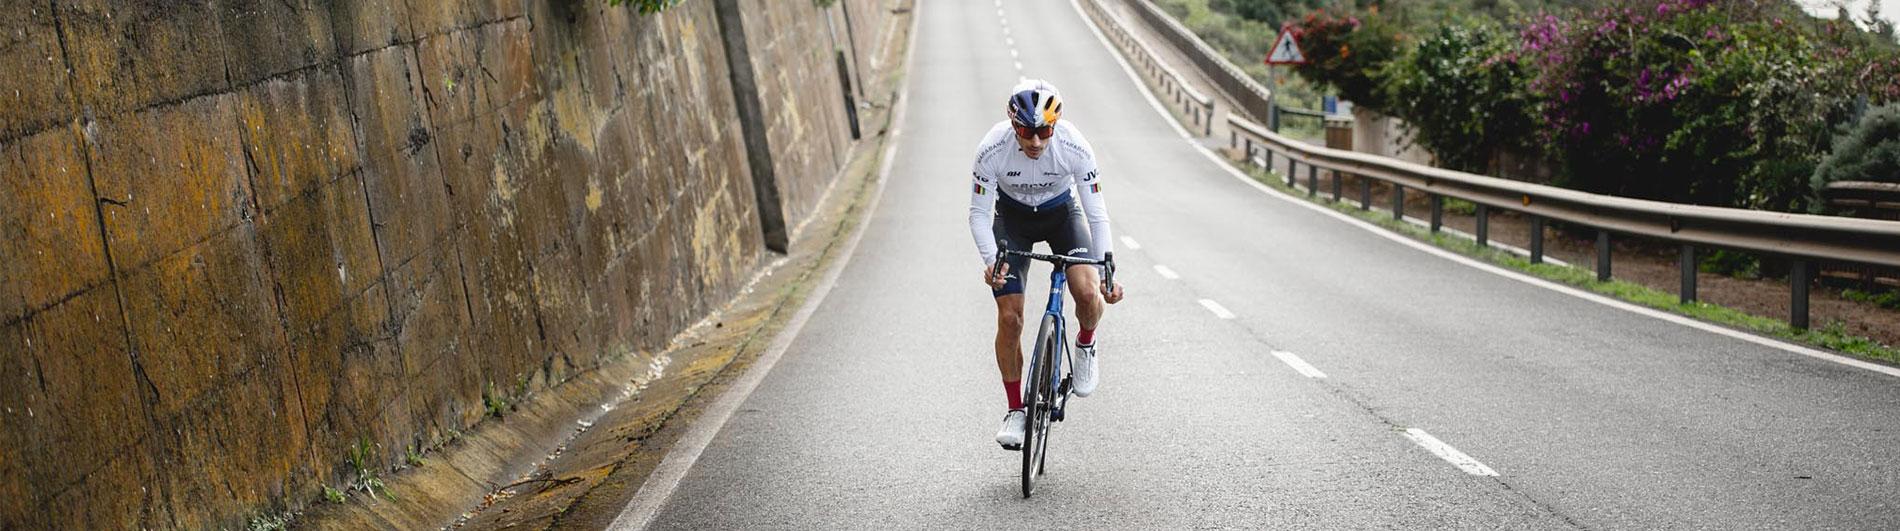 Pneus Vélo Route & Triathlon